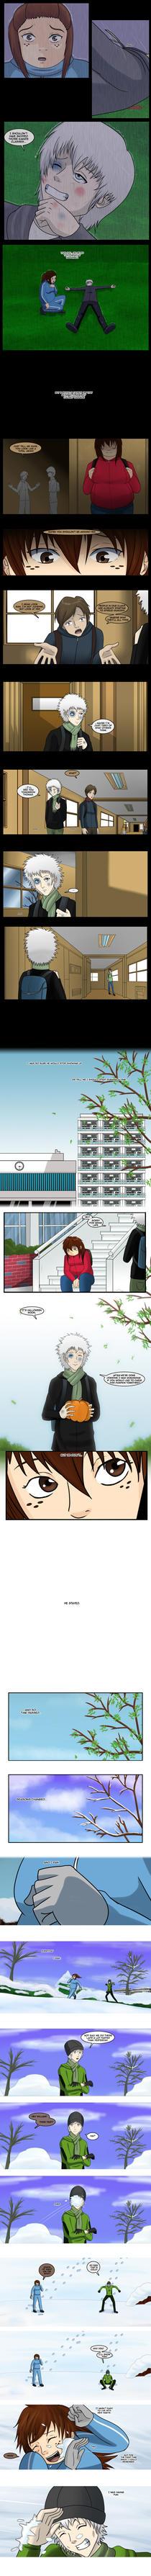 I Care - Part 6  (Webtoon Challenge) by Edowaado